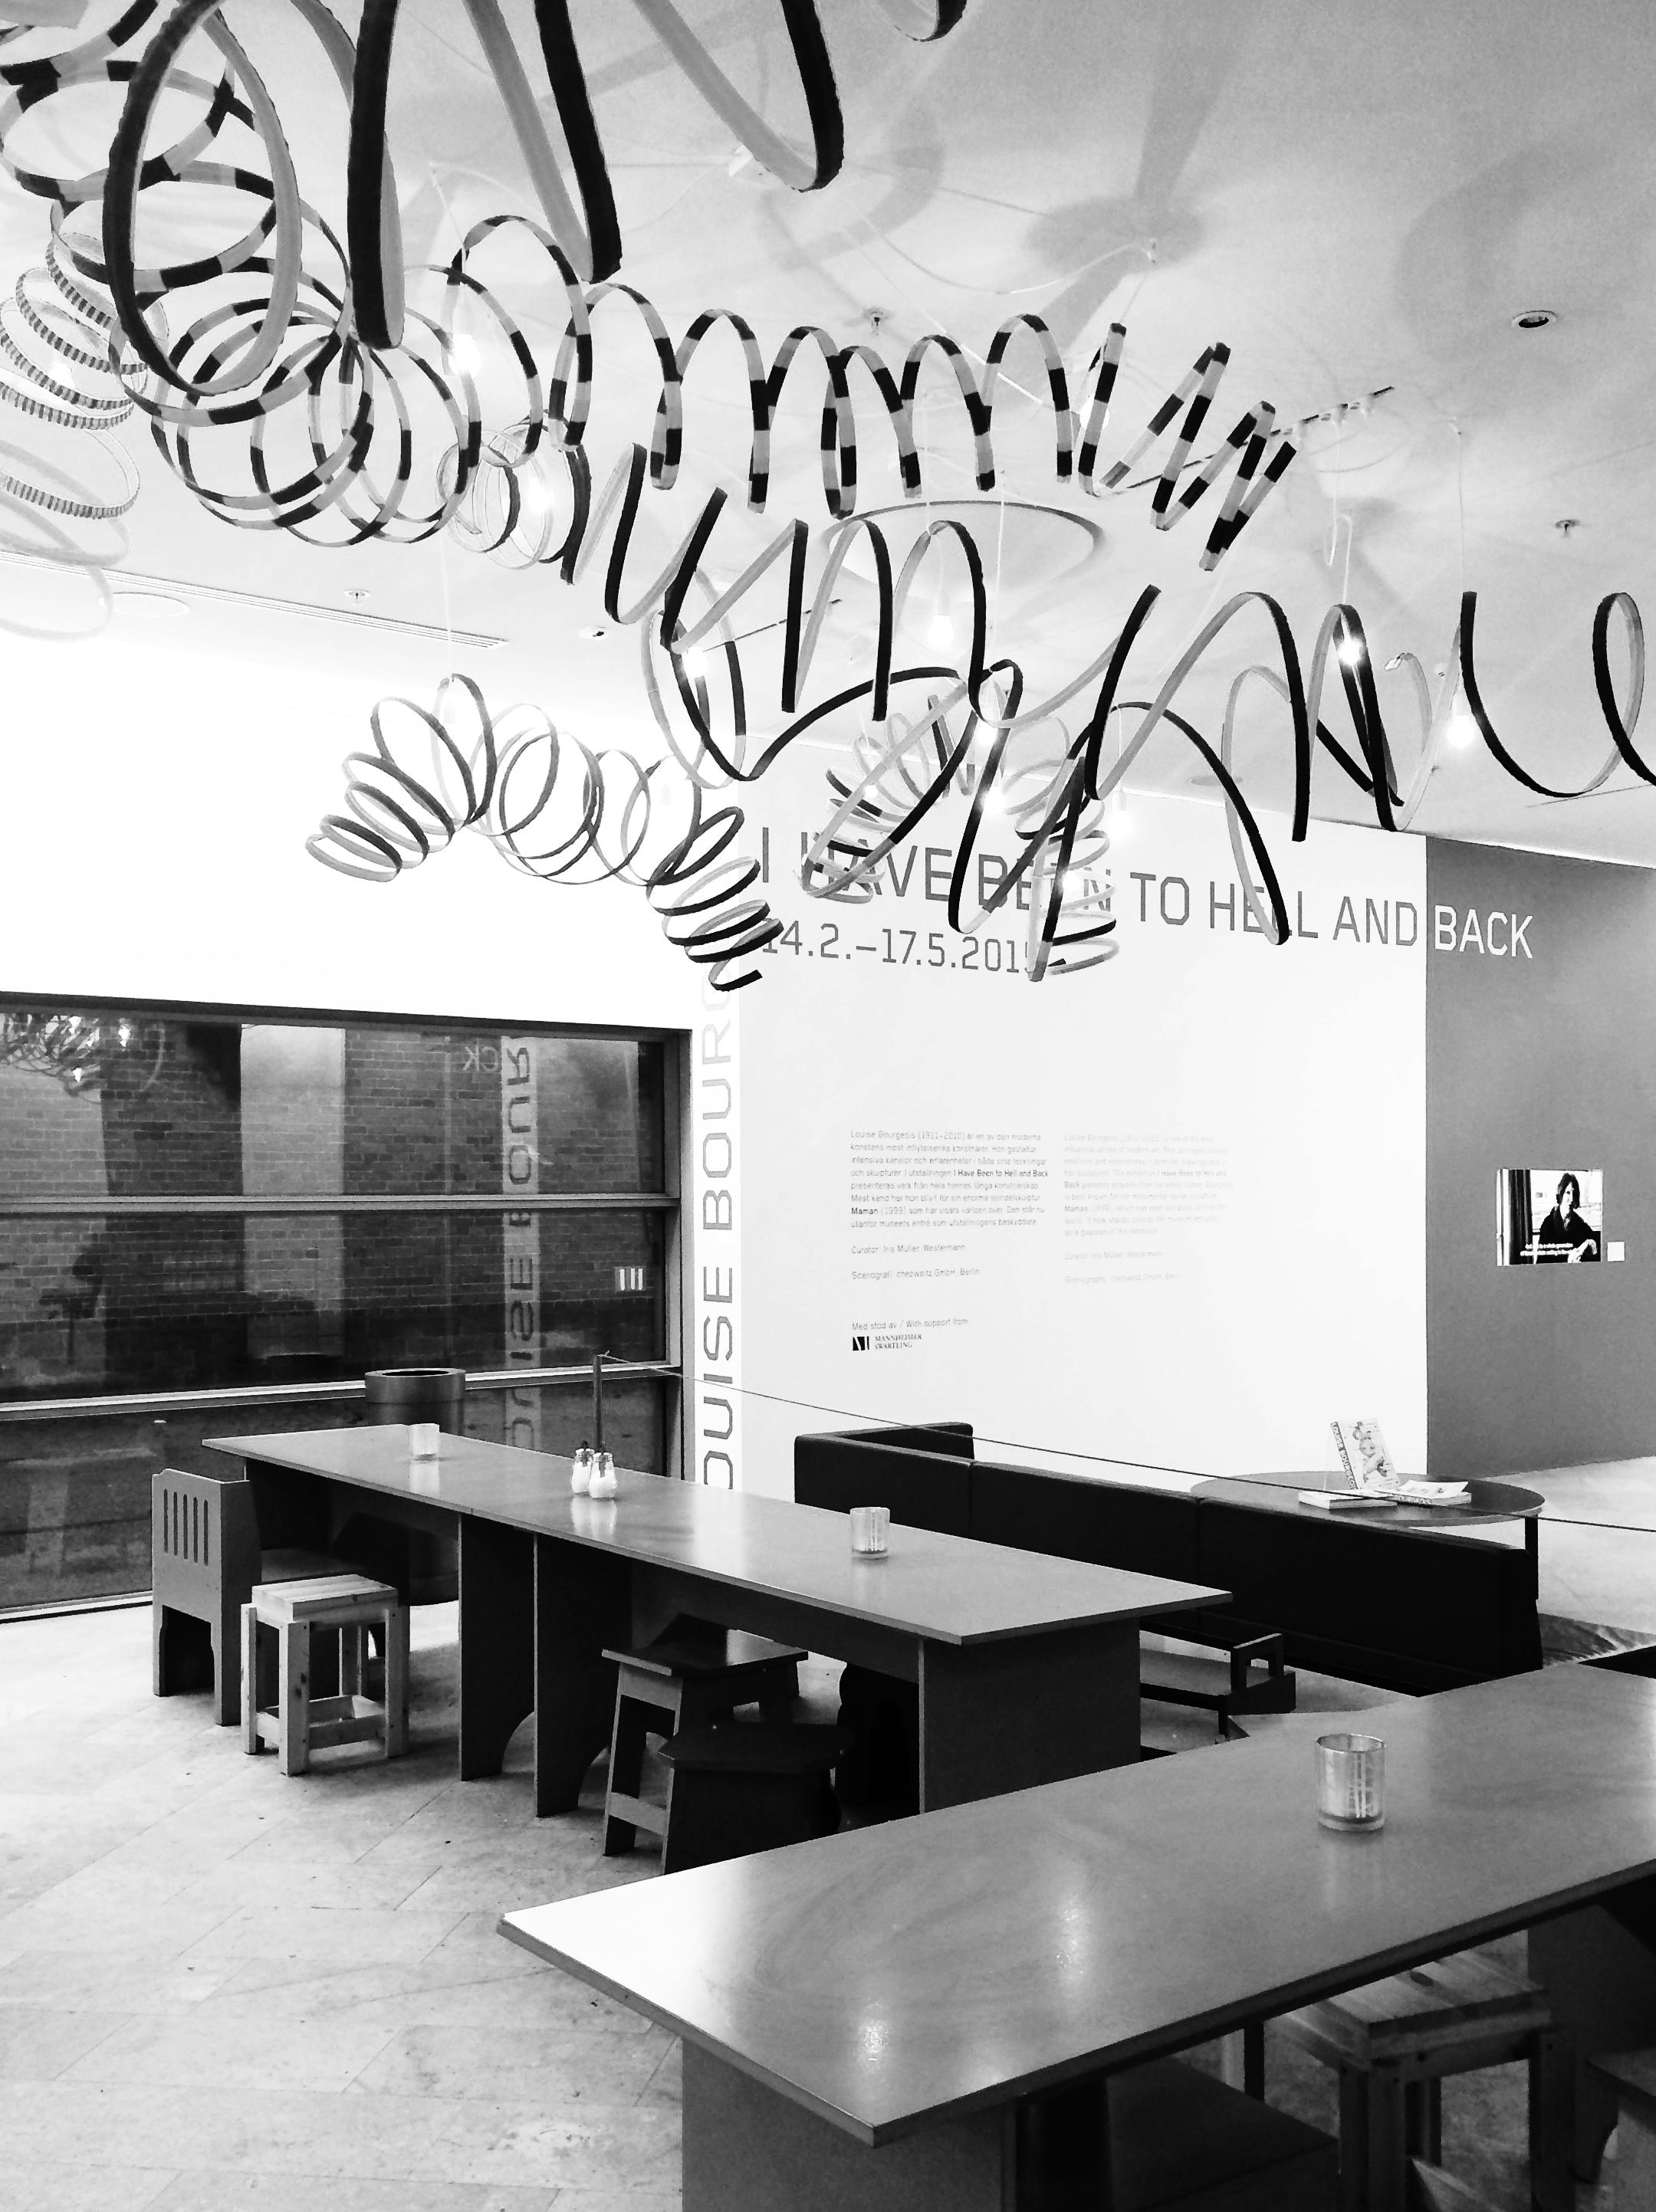 museumentry.jpg